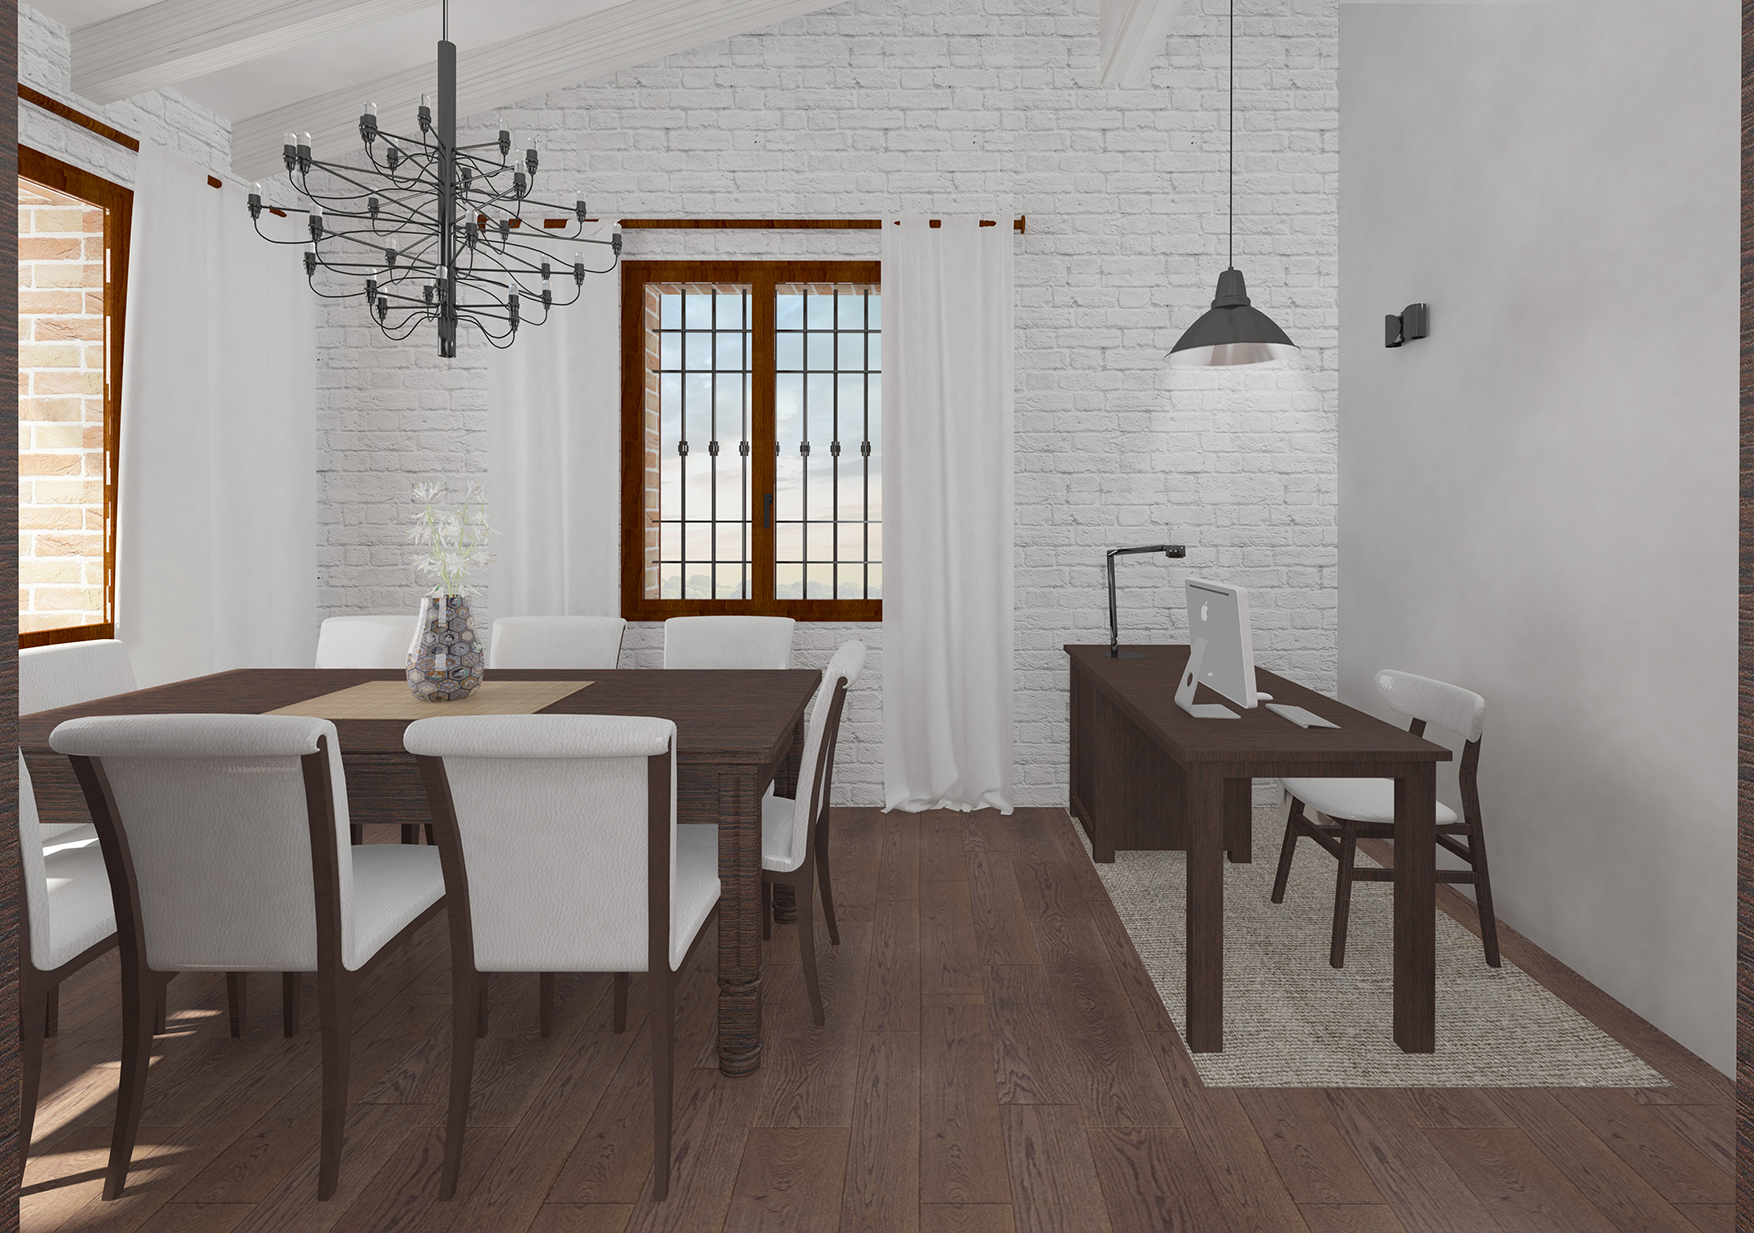 Pranzo - Studio